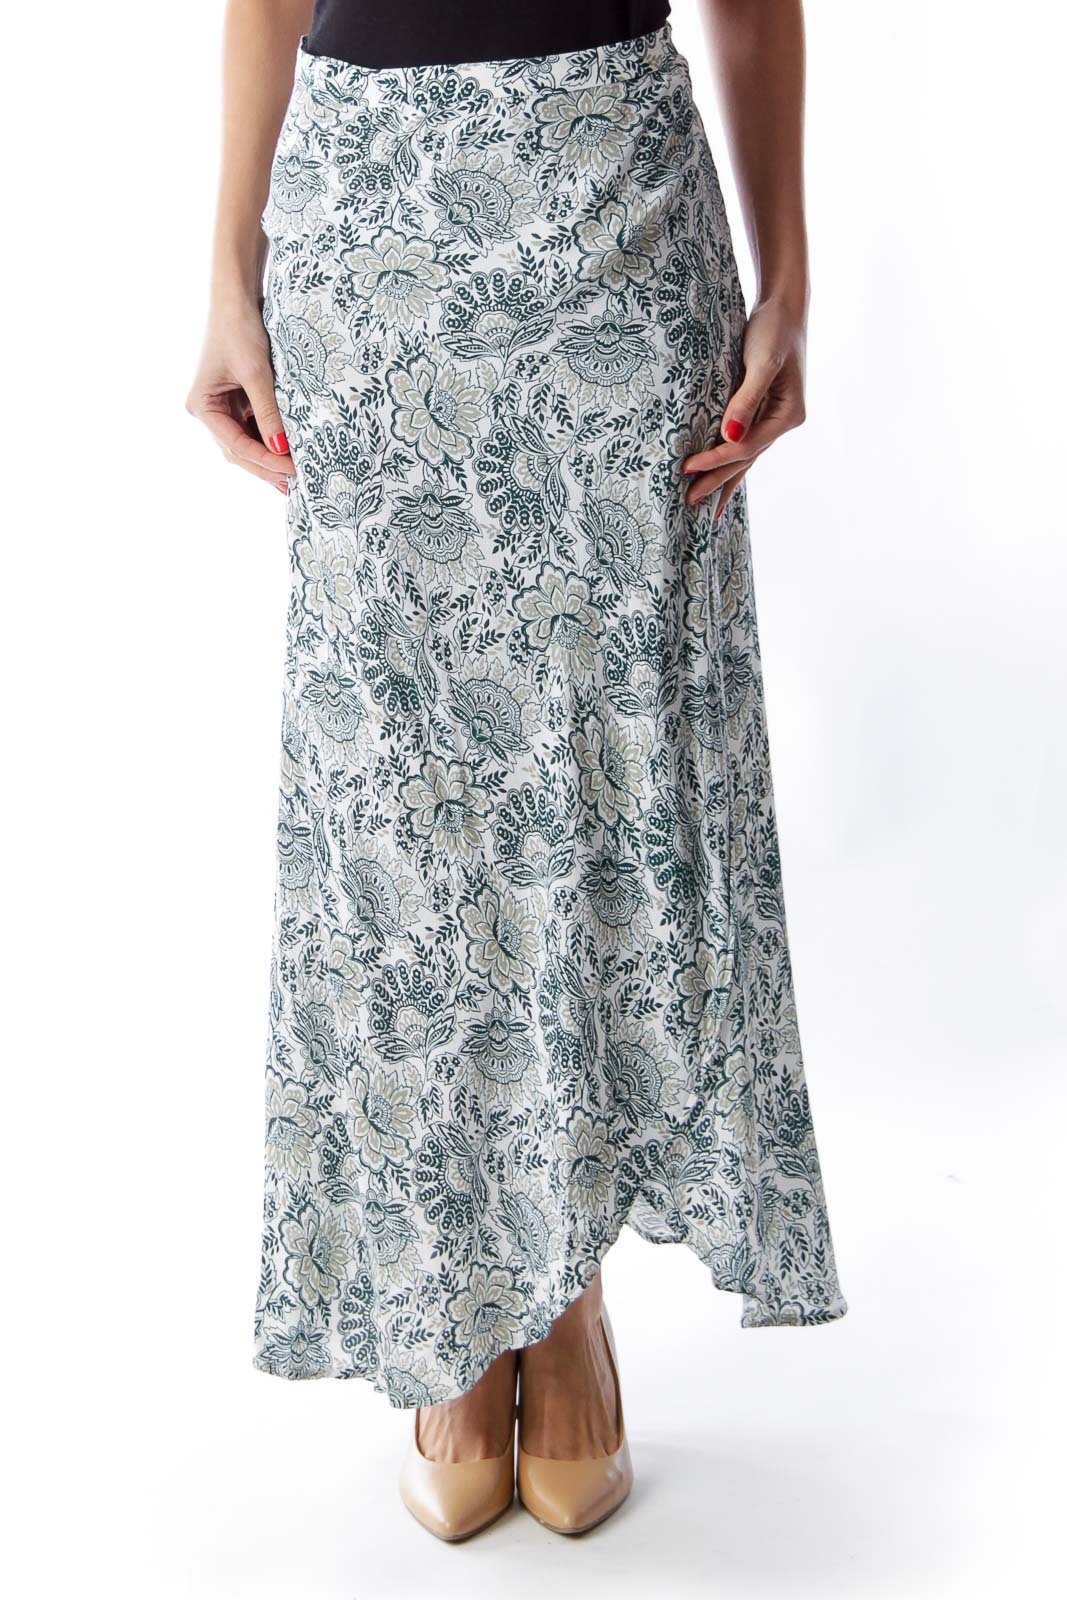 Green Print Wrap Skirt Front